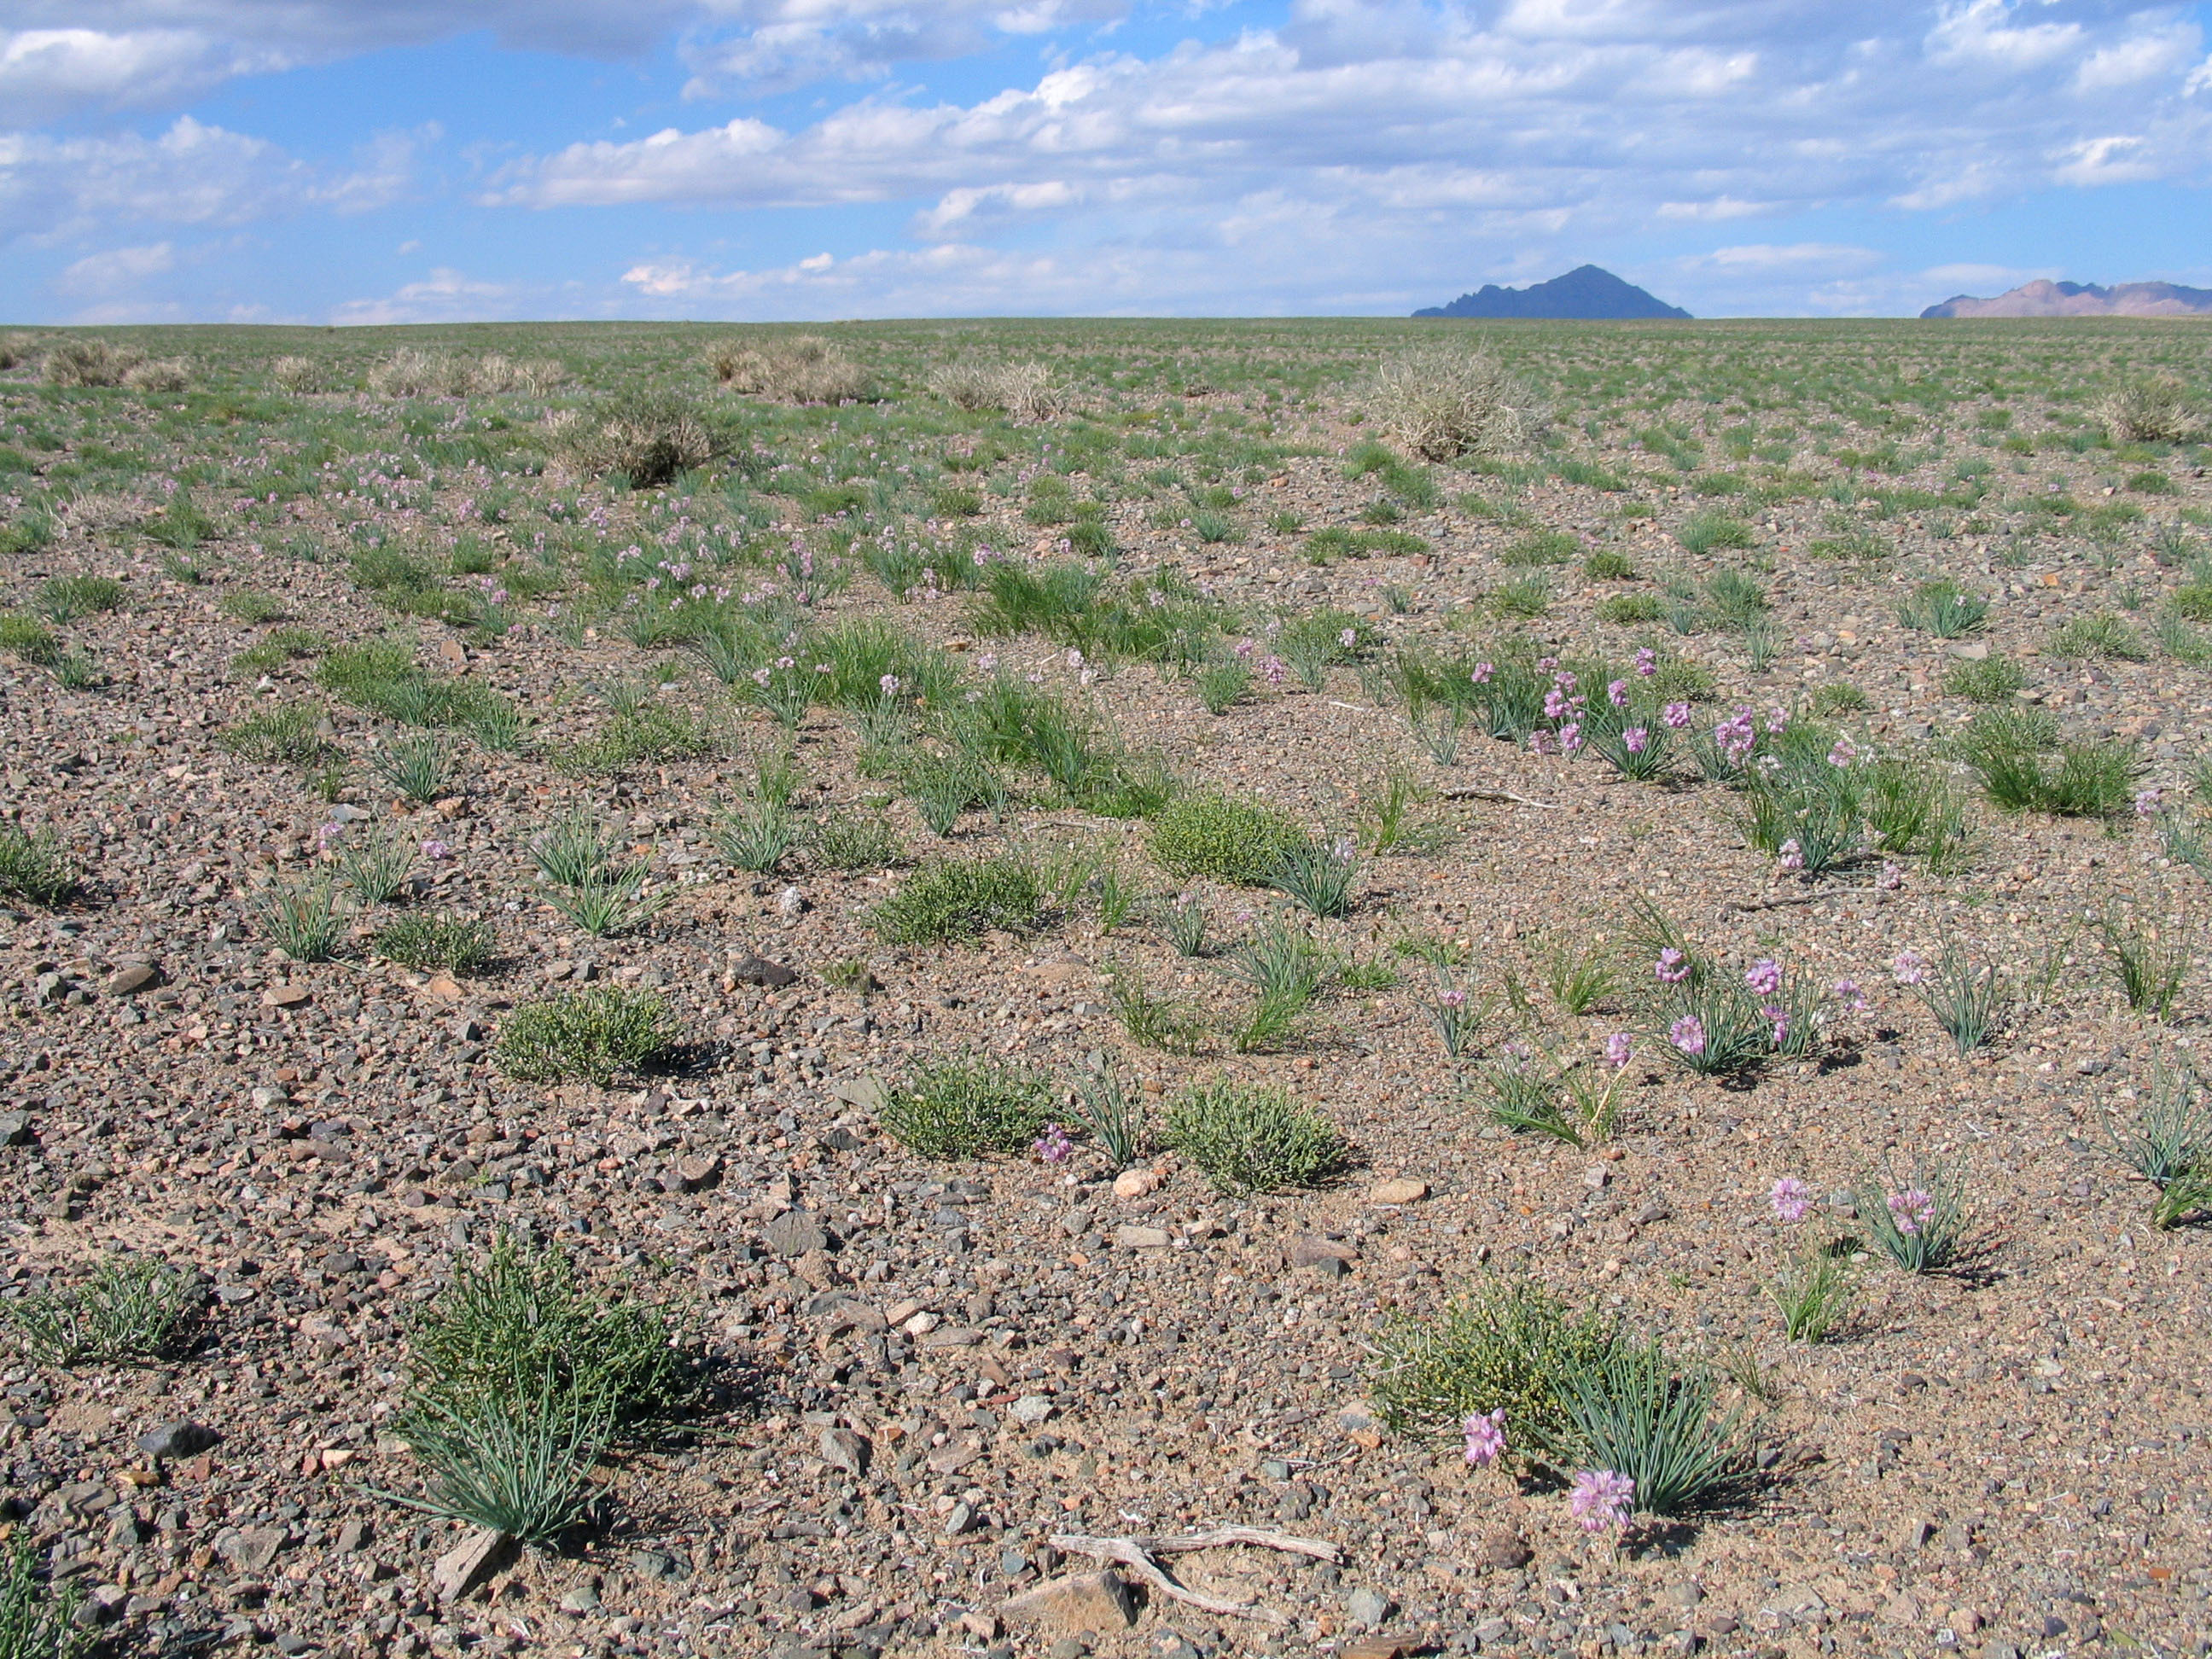 view image: Arnebia guttata Bunge